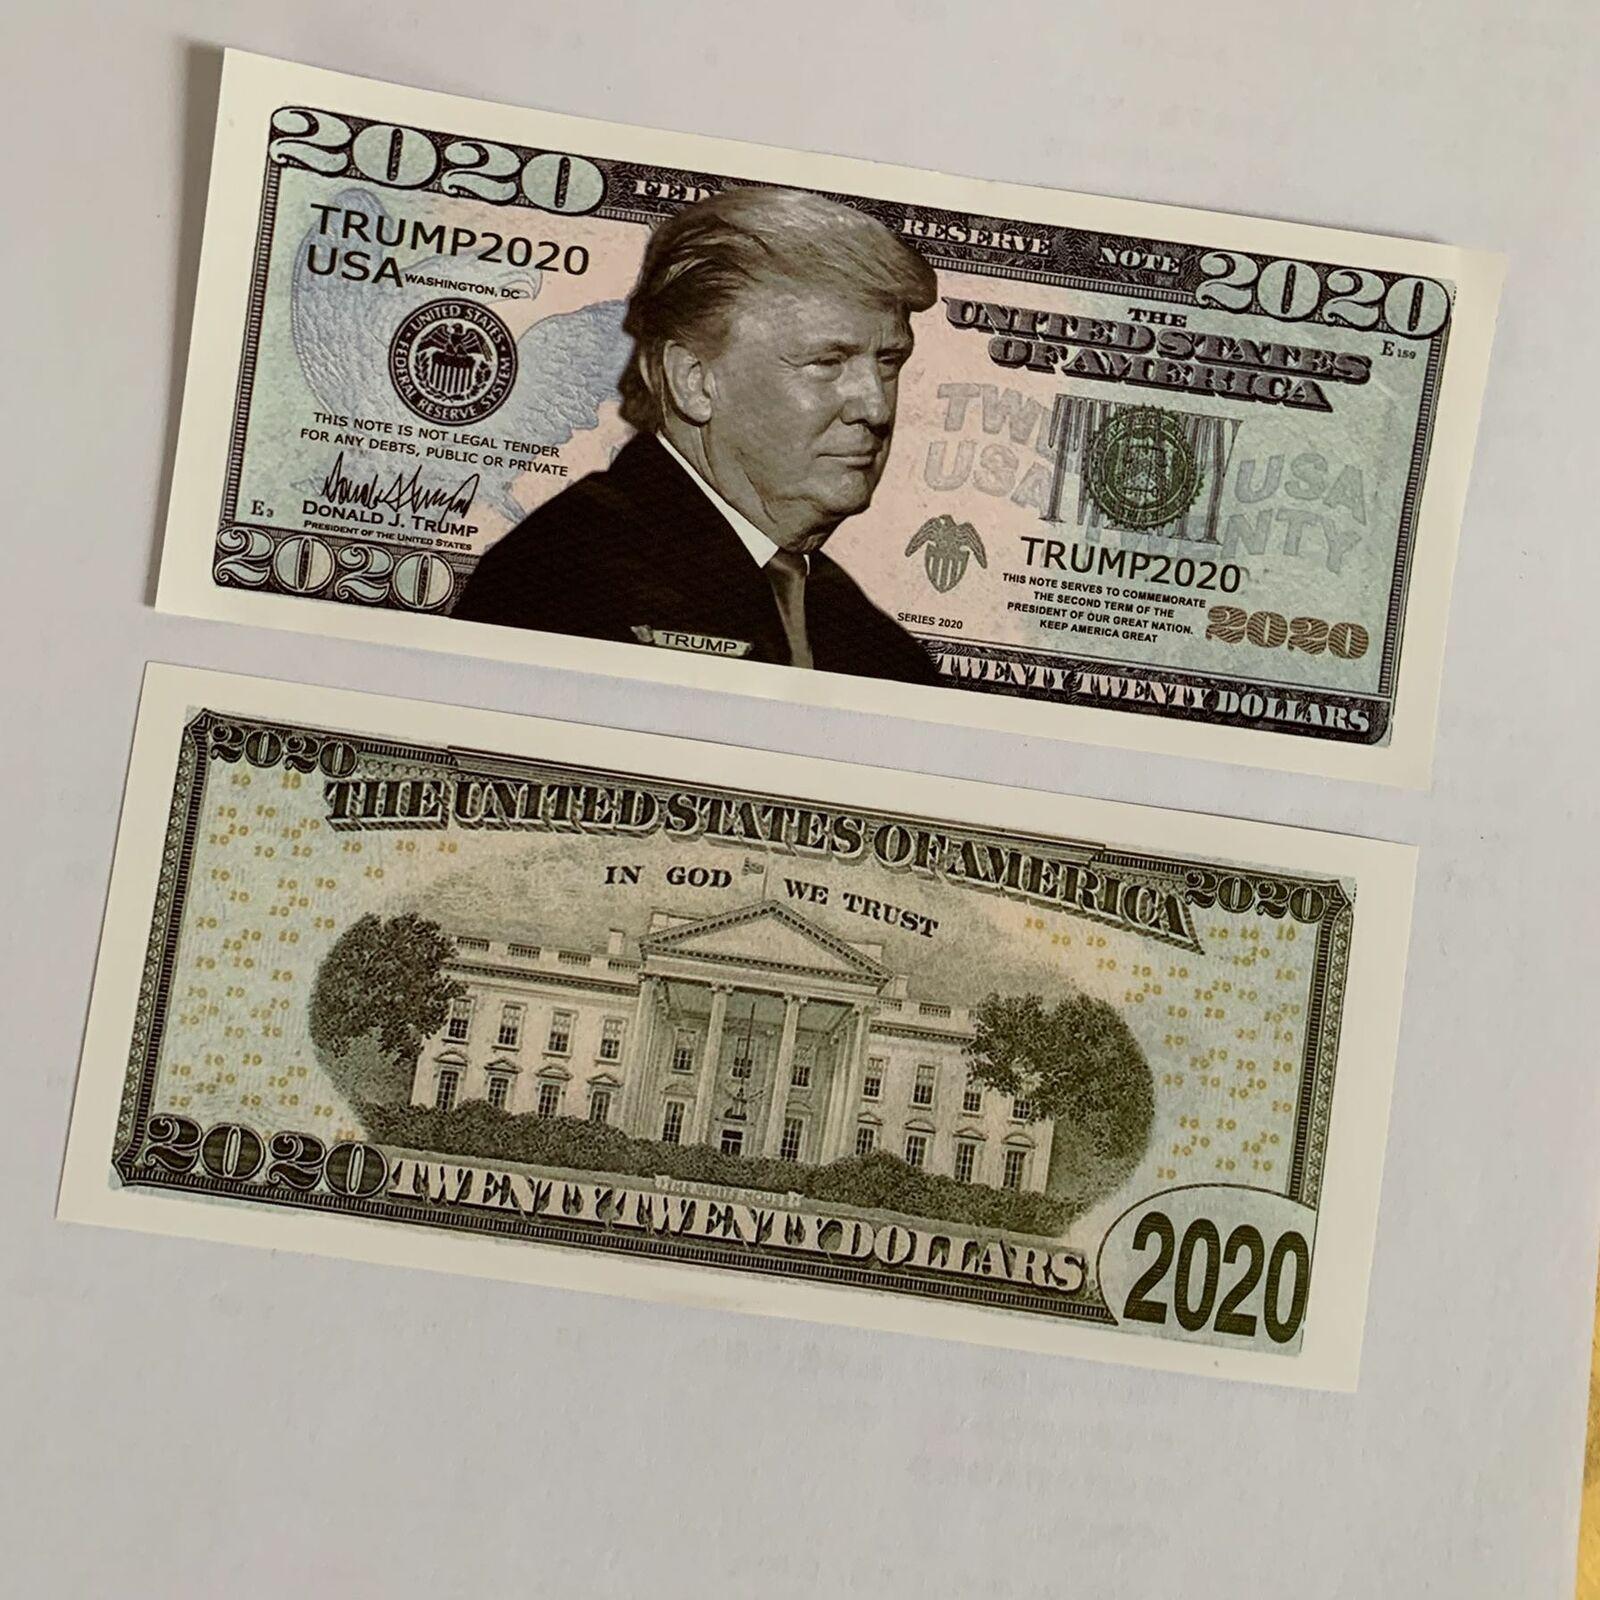 5 шт 2020 памятный значок Дональда Трампа монета президент бумажная банкнота без валюты